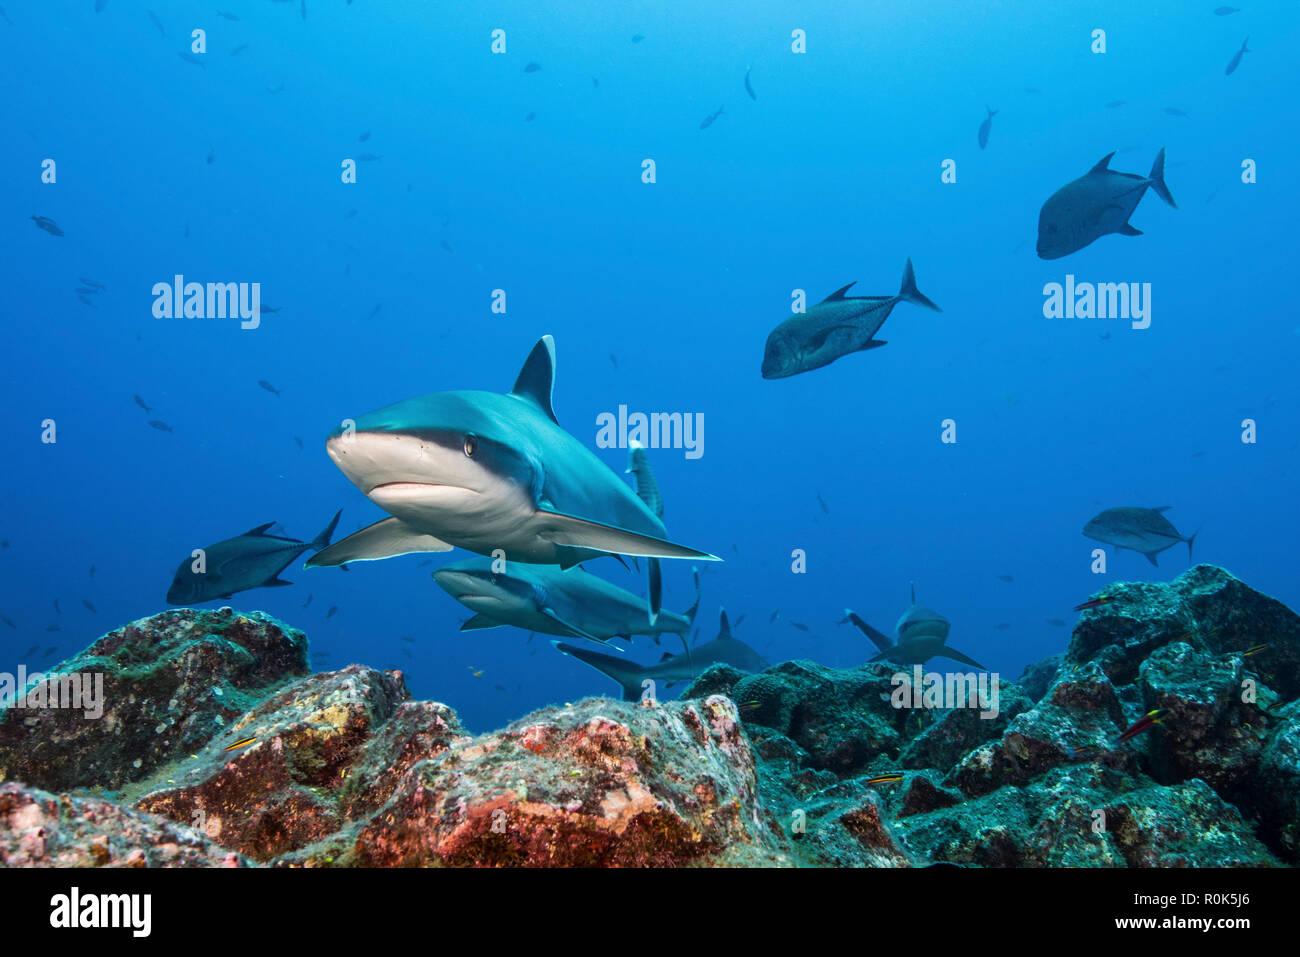 A school of silvertip sharks, Socorro Island, Mexico. - Stock Image